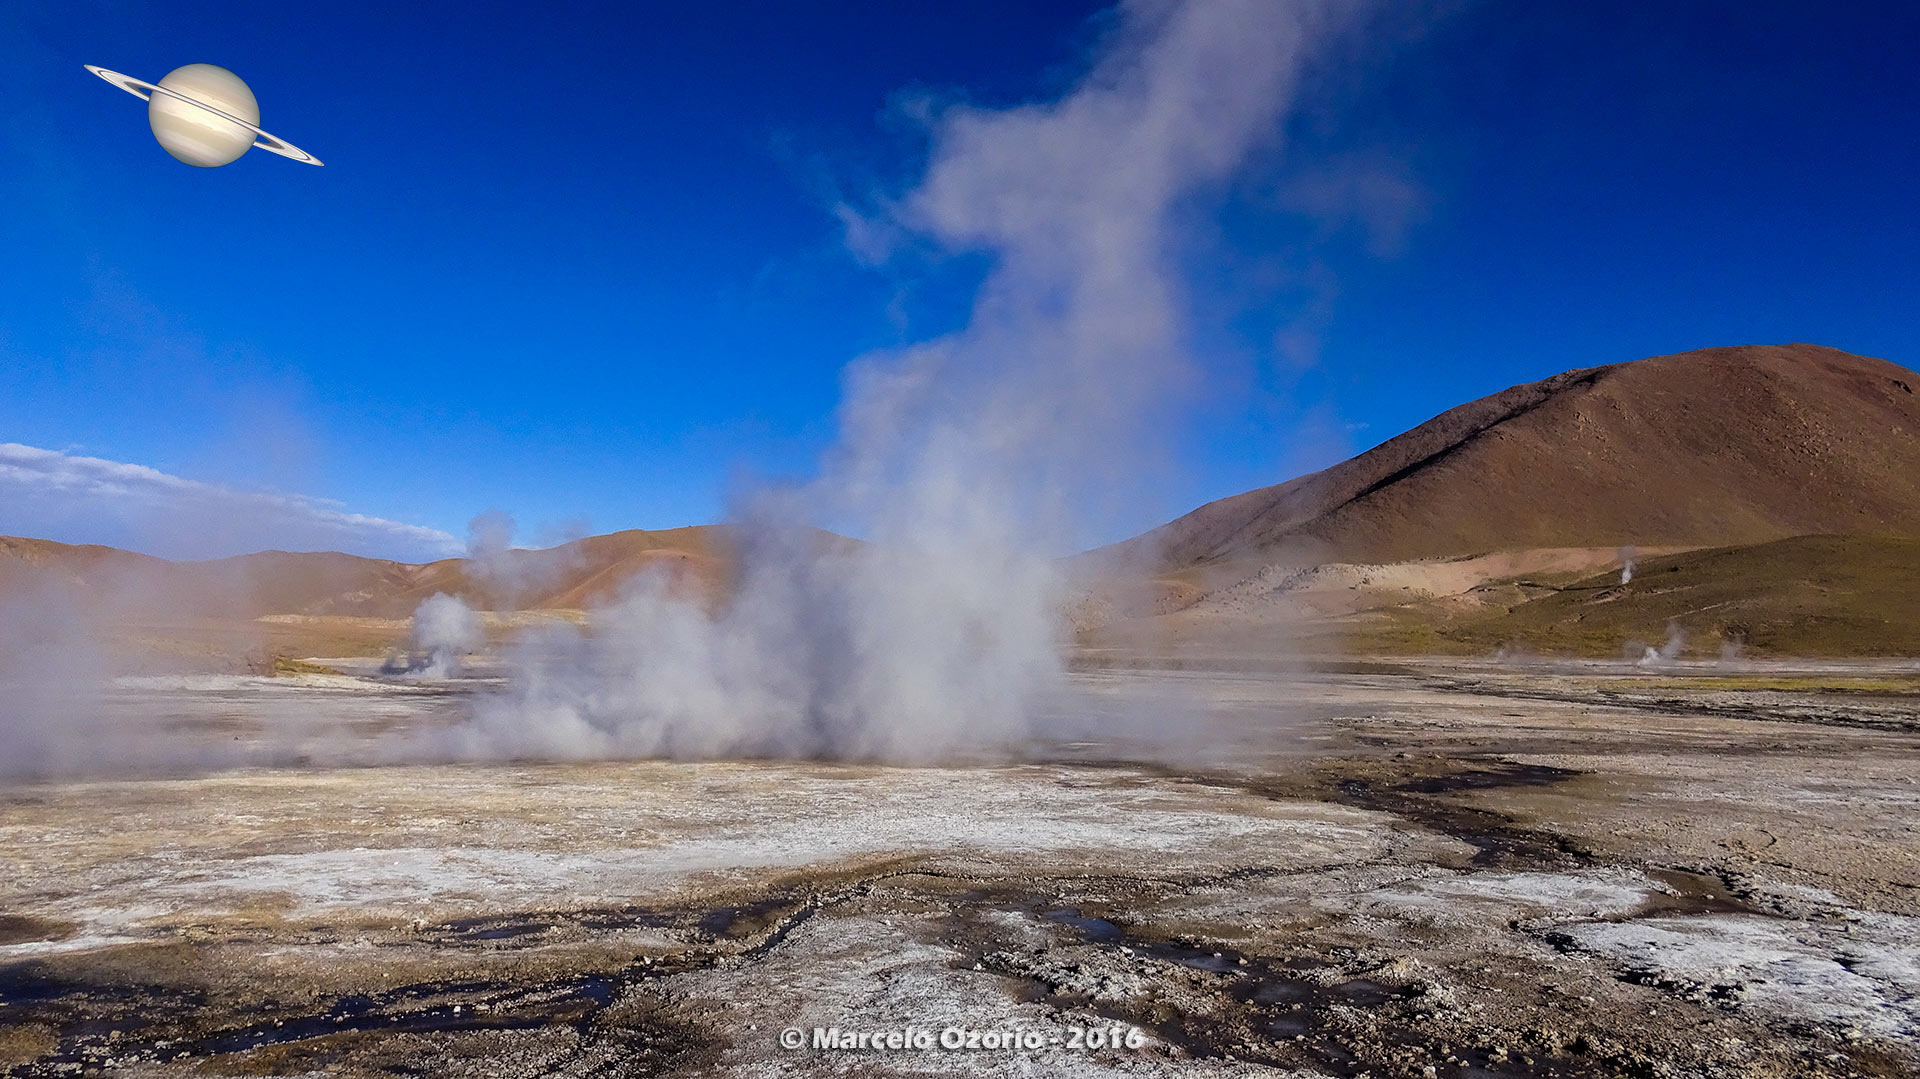 el tatio geysers atacama desert 22 - Os Surreais Gêiseres El Tatio - Deserto do Atacama - Chile